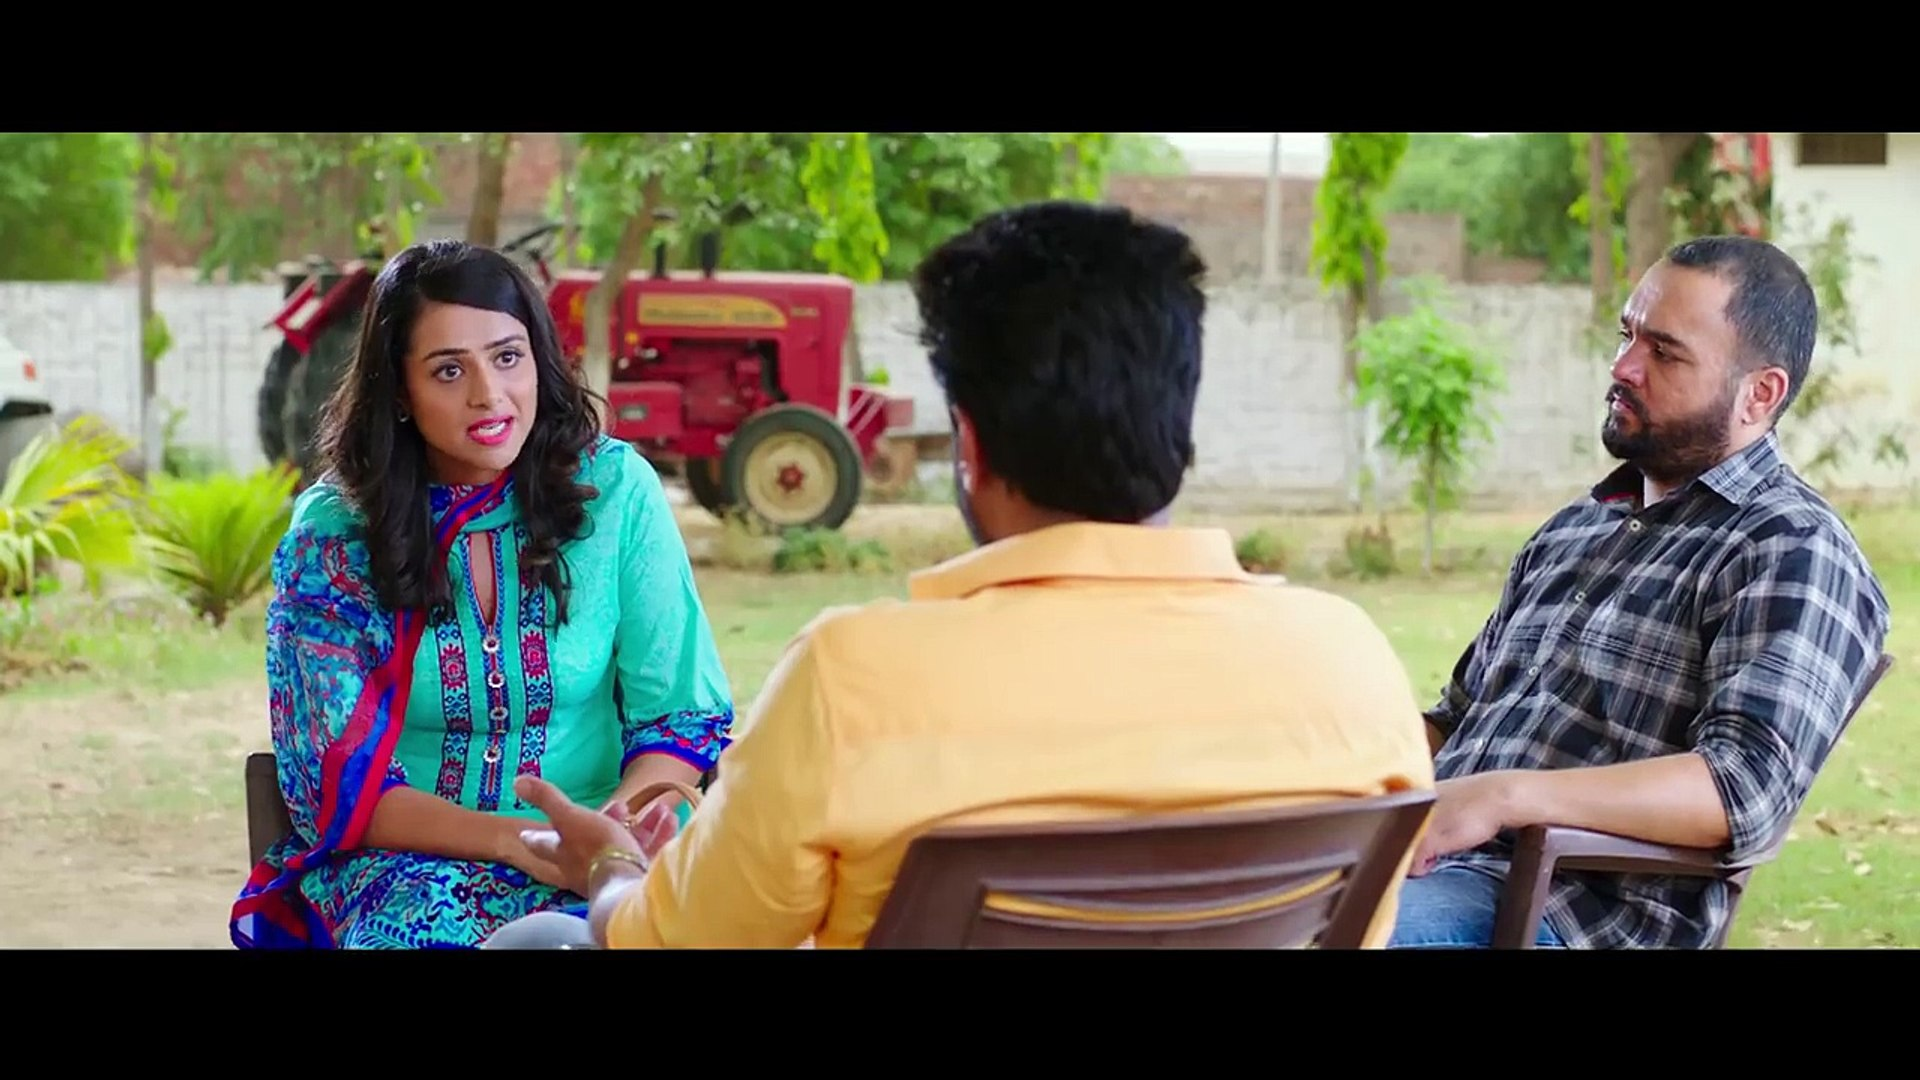 Bailaras 2017 latest punjabi movie HD Part 3